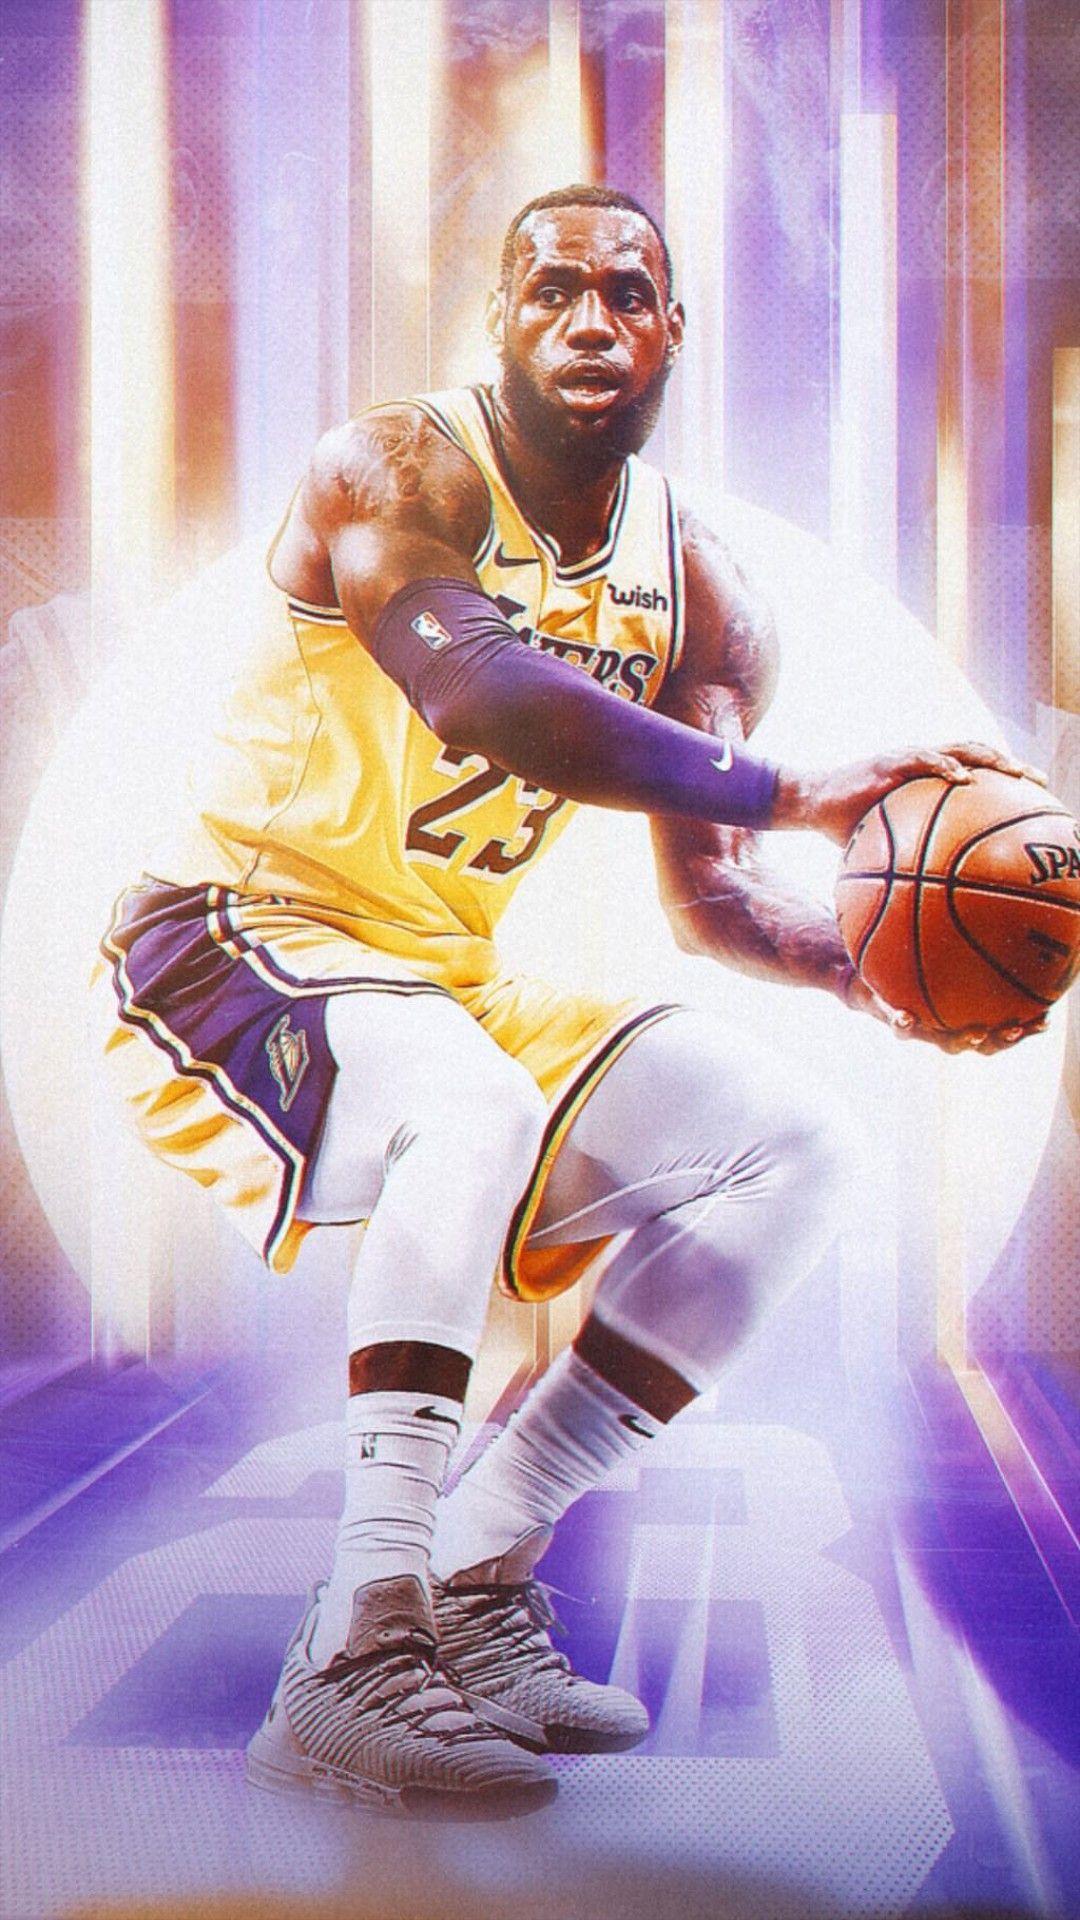 Lebron James La Lakers Wallpaper Lebron James Lakers Lebron James Wallpapers King Lebron James